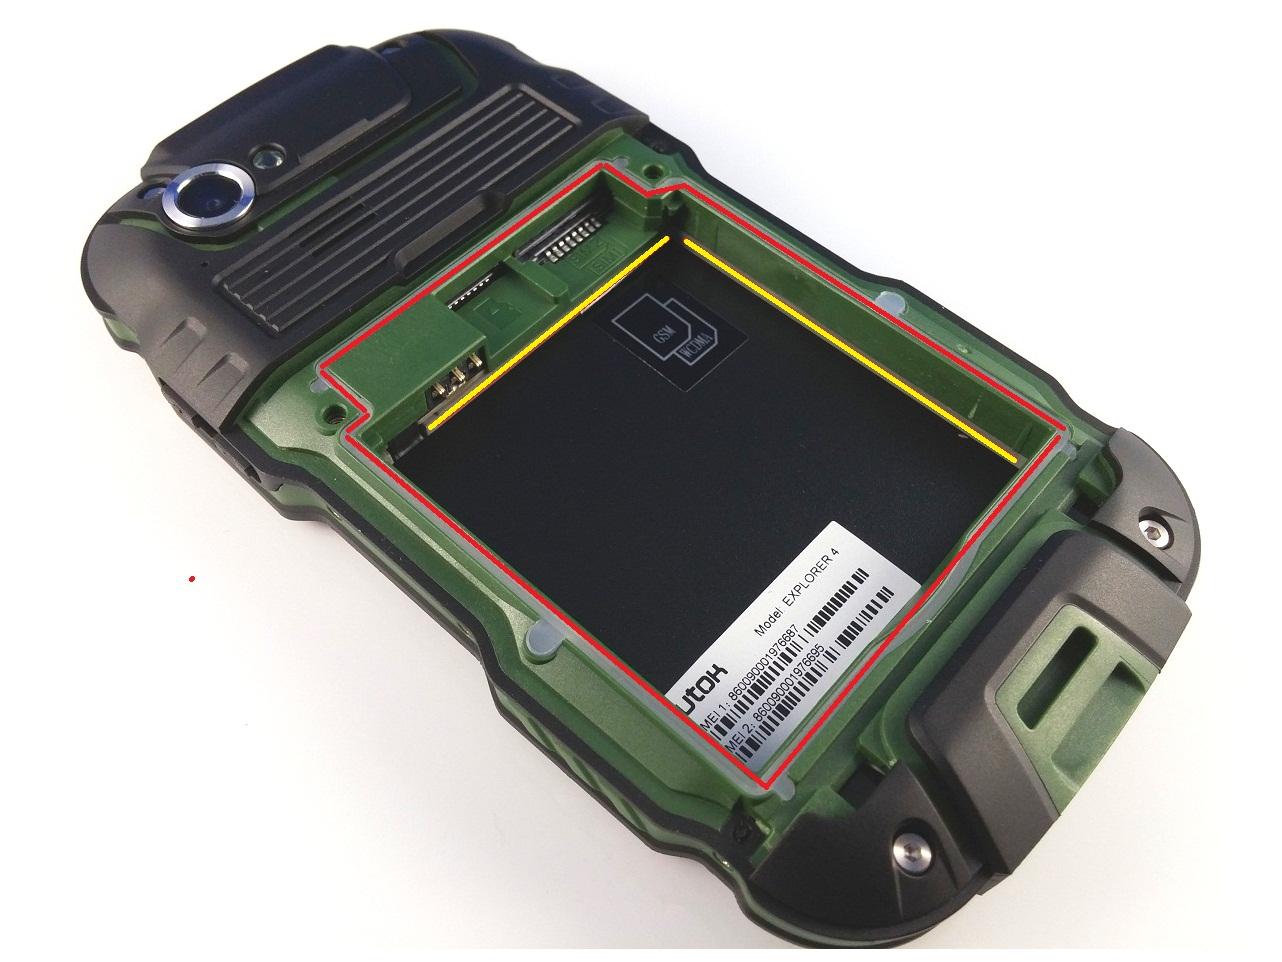 gar Unboxing UTOK Explorer 4, telefon rugged IP 68